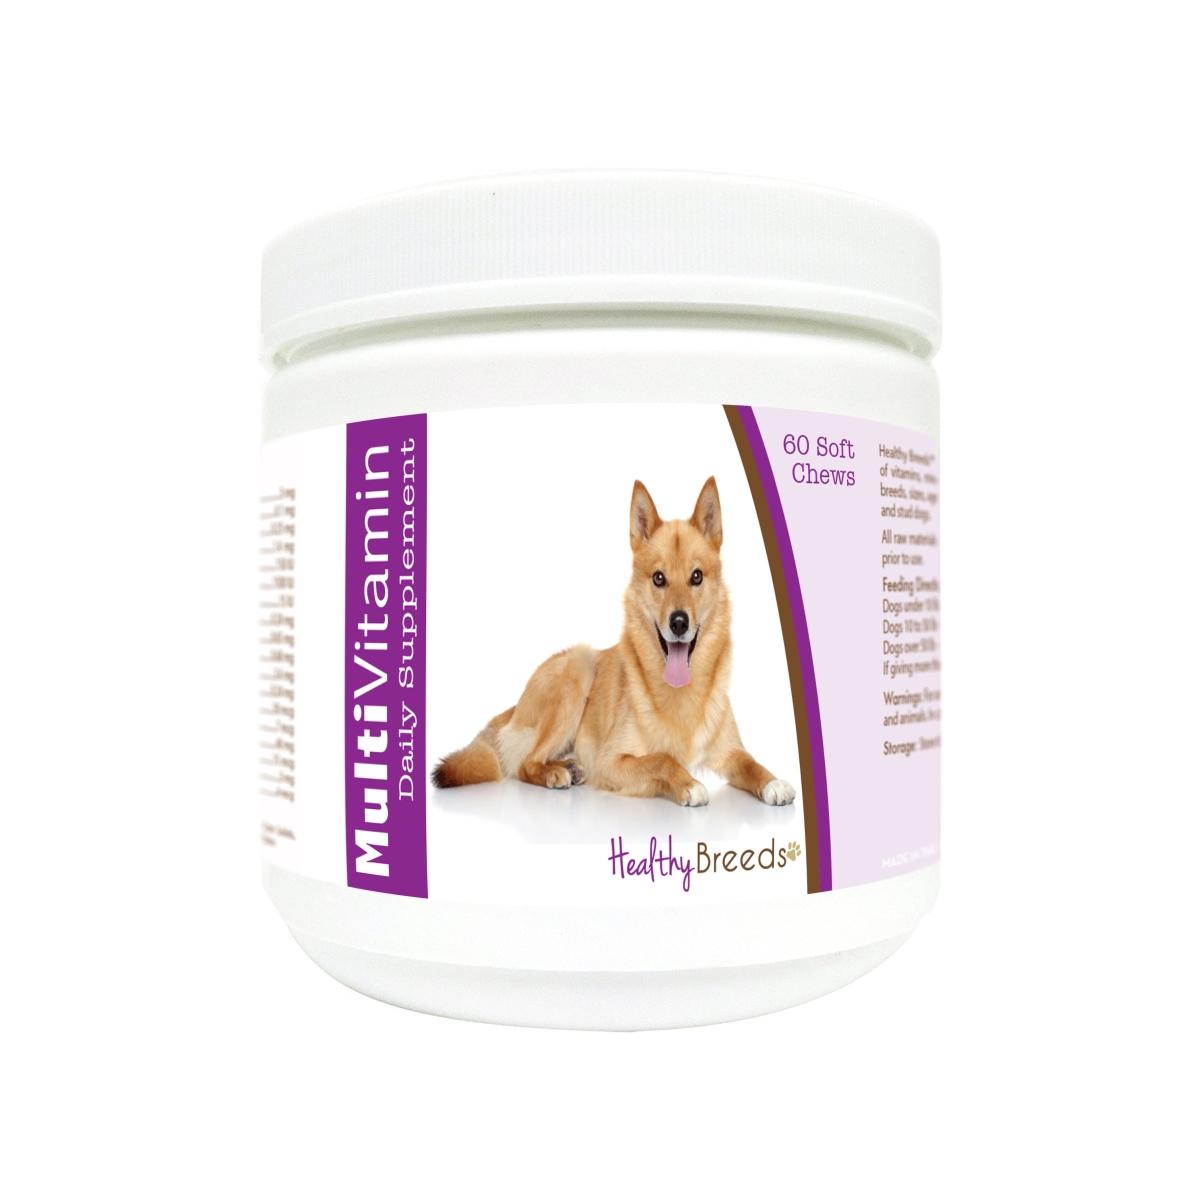 Healthy Breeds 840235177371 Finnish Spitz Multi-Vitamin Soft Chews - 60 Count